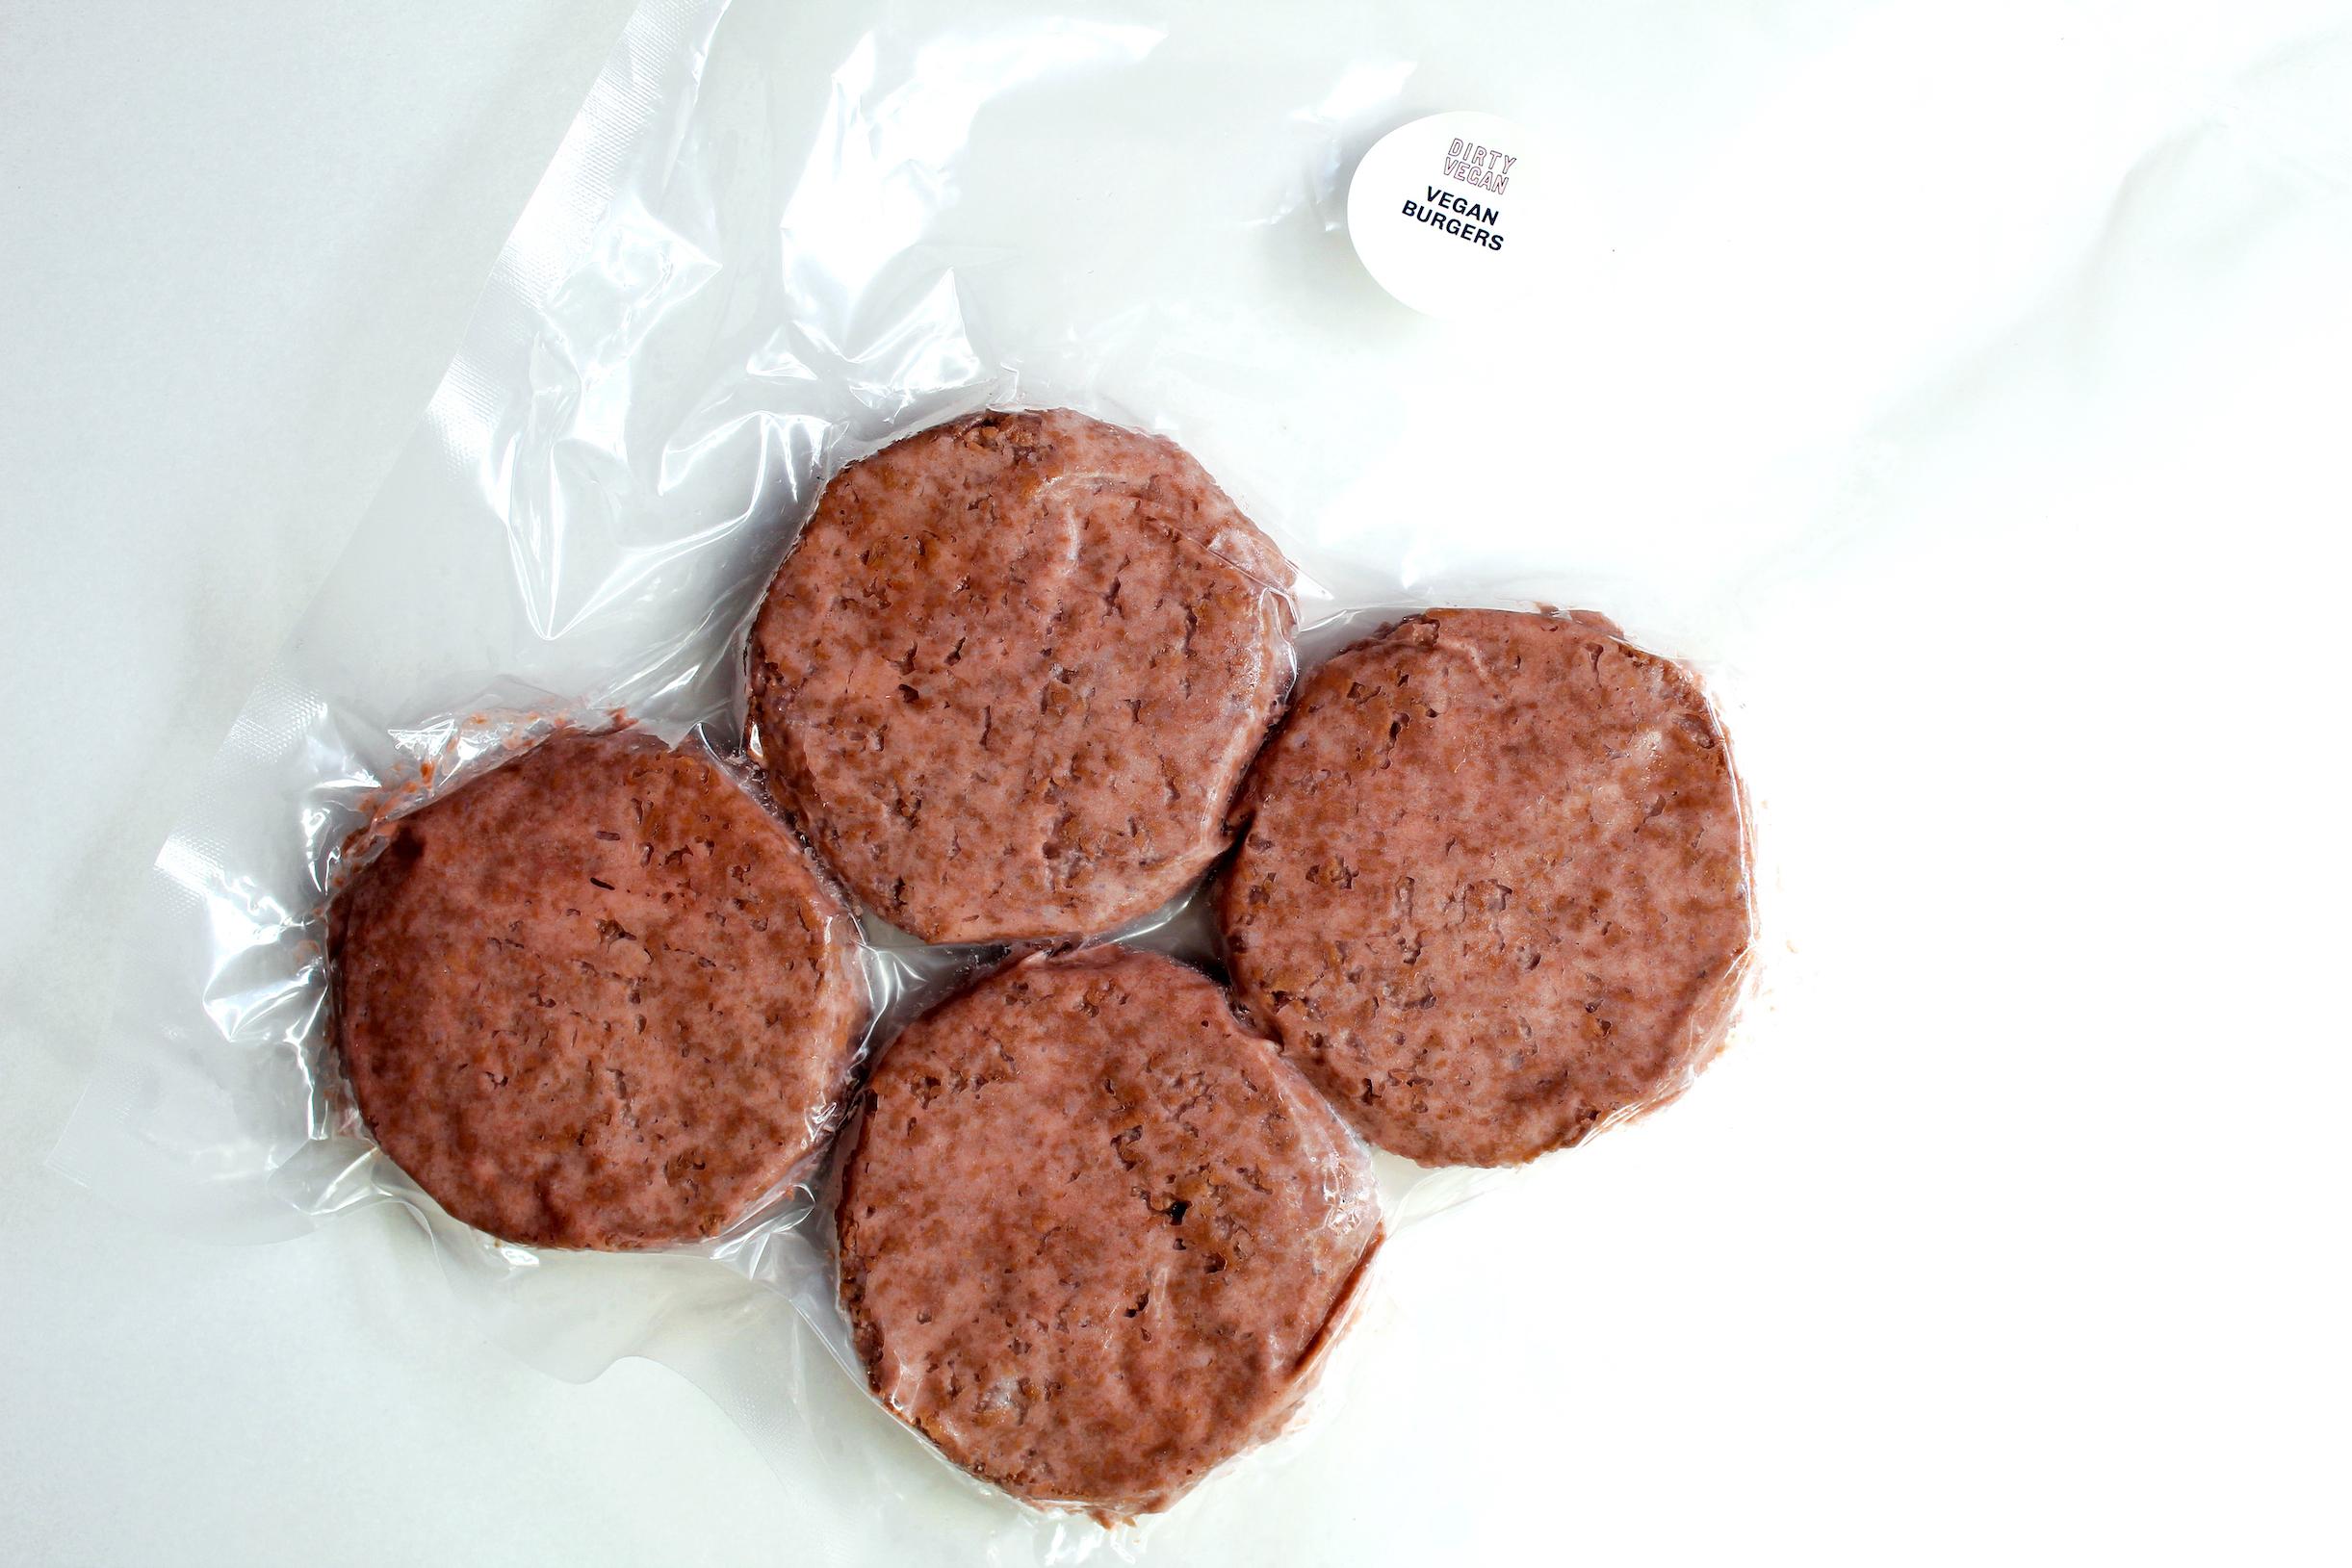 Dirty Vegan Burger Kit